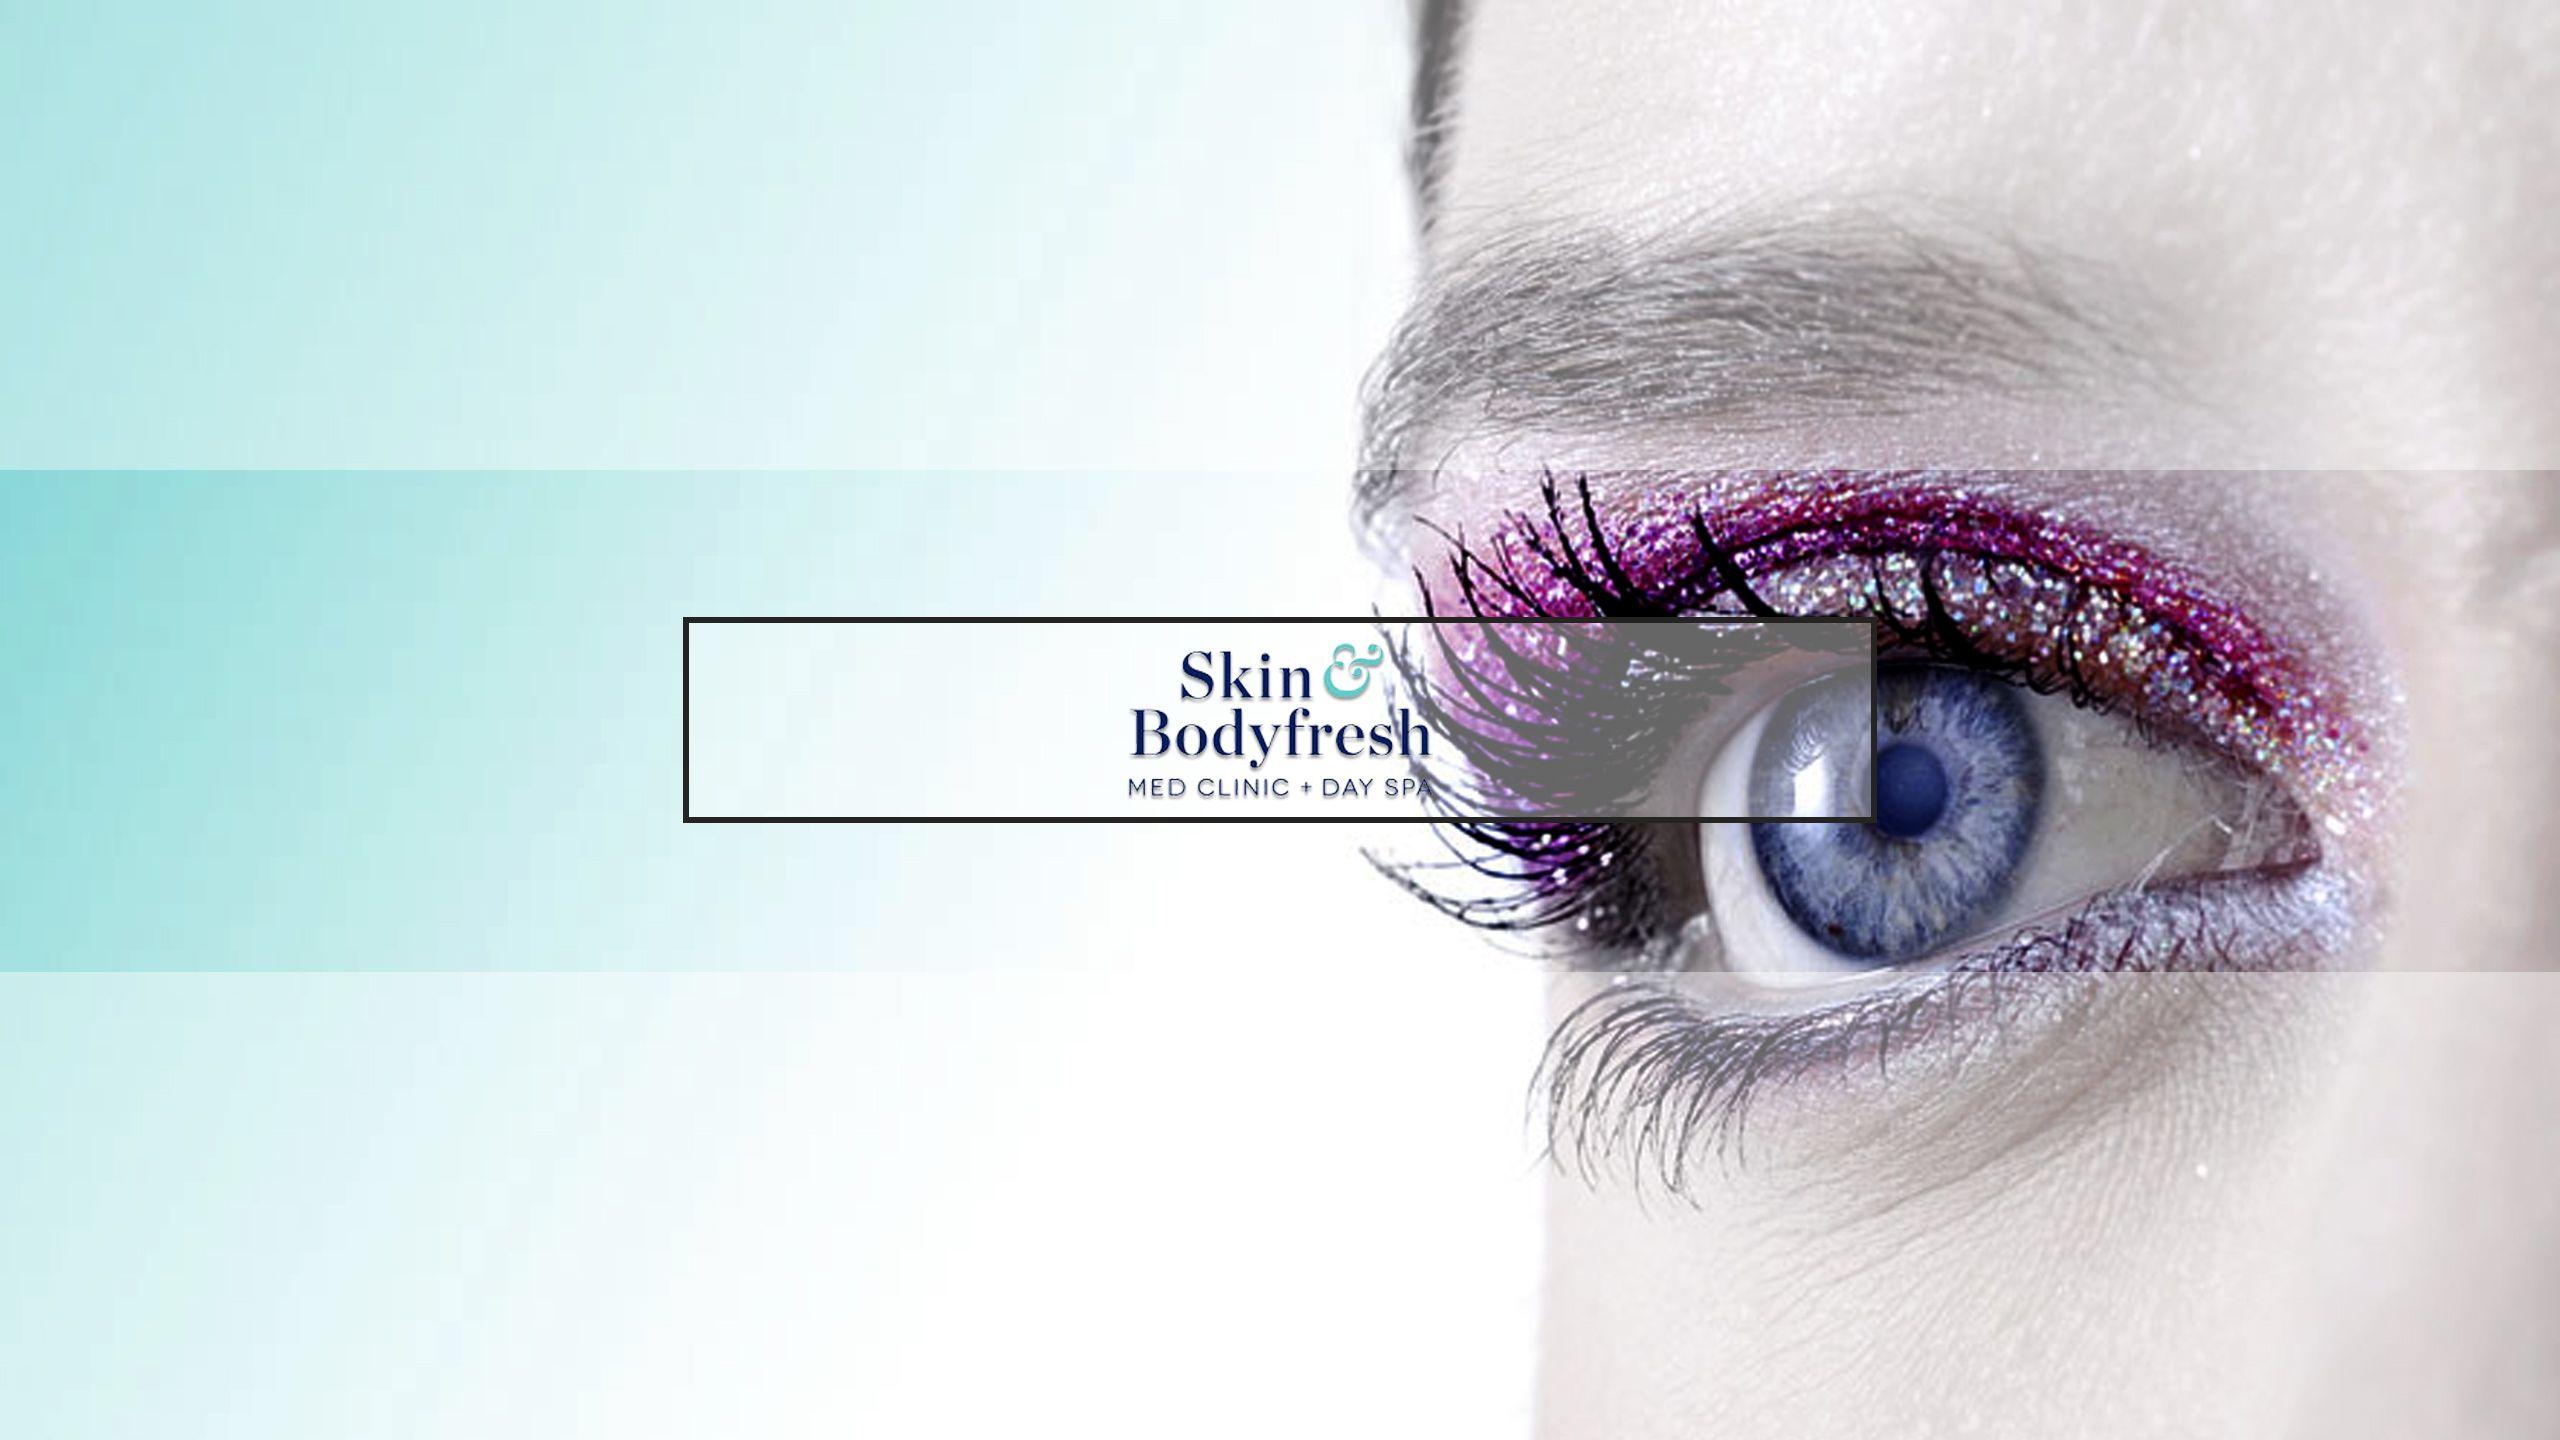 Skin & Bodyfresh Med Clinic + Day Spa is a Medical Spa